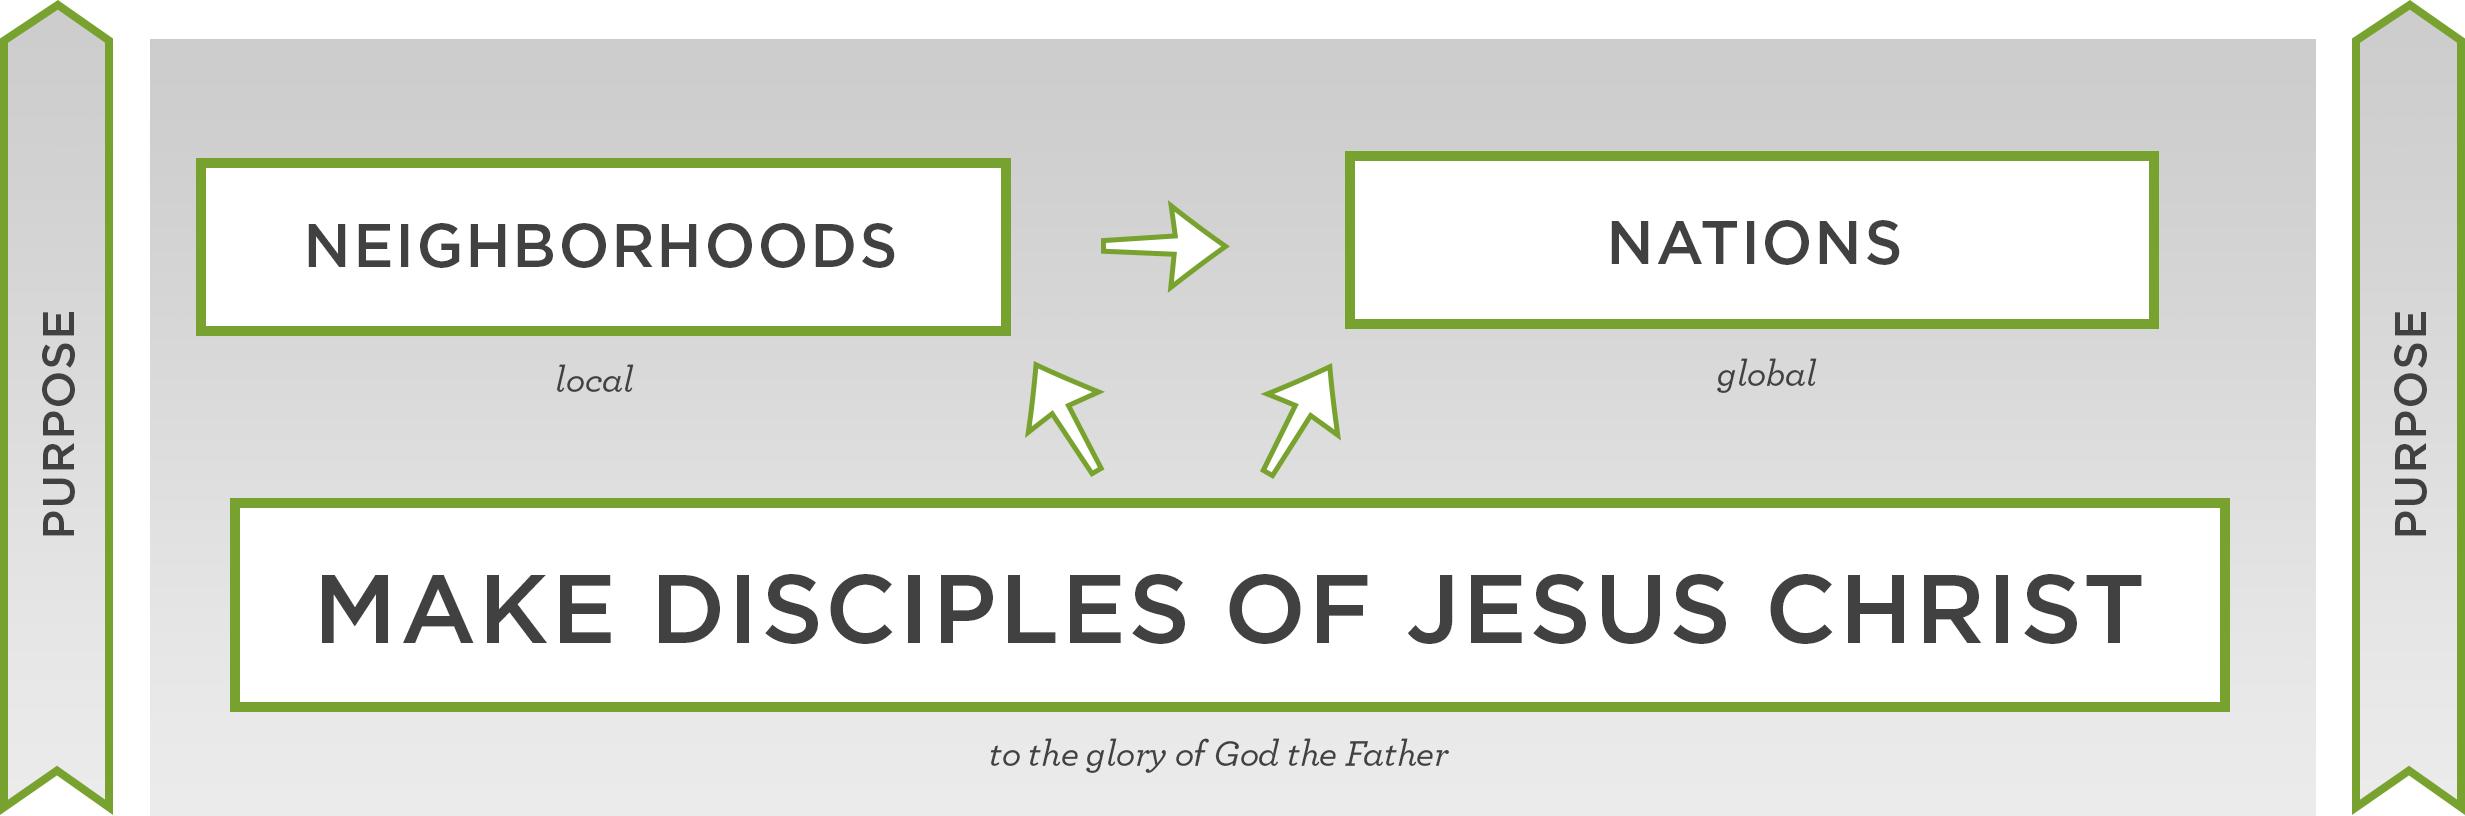 Discipleship+Framework+-+Purpose.jpg